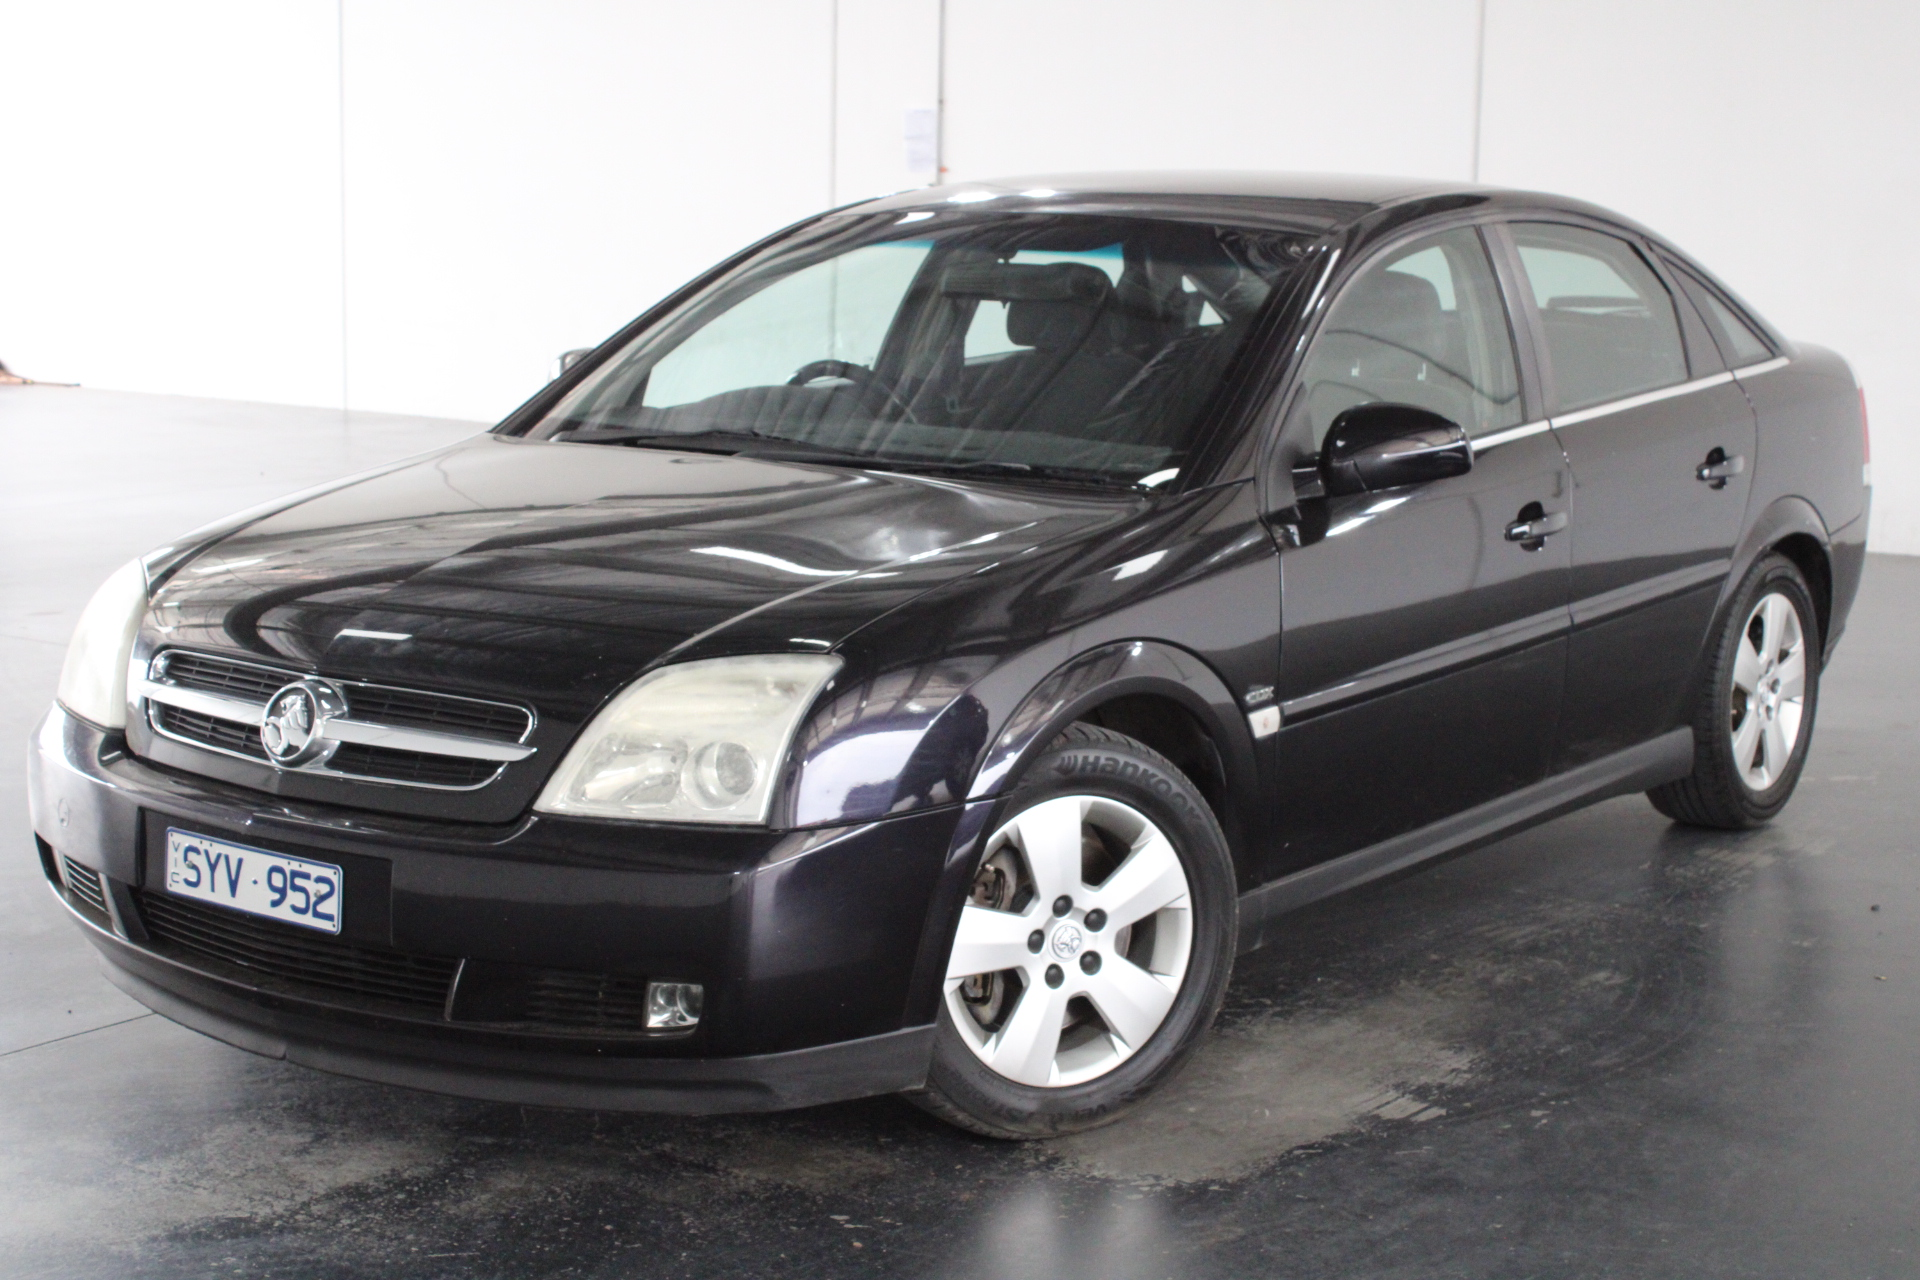 2004 Holden Vectra CDX ZC Automatic Hatchback